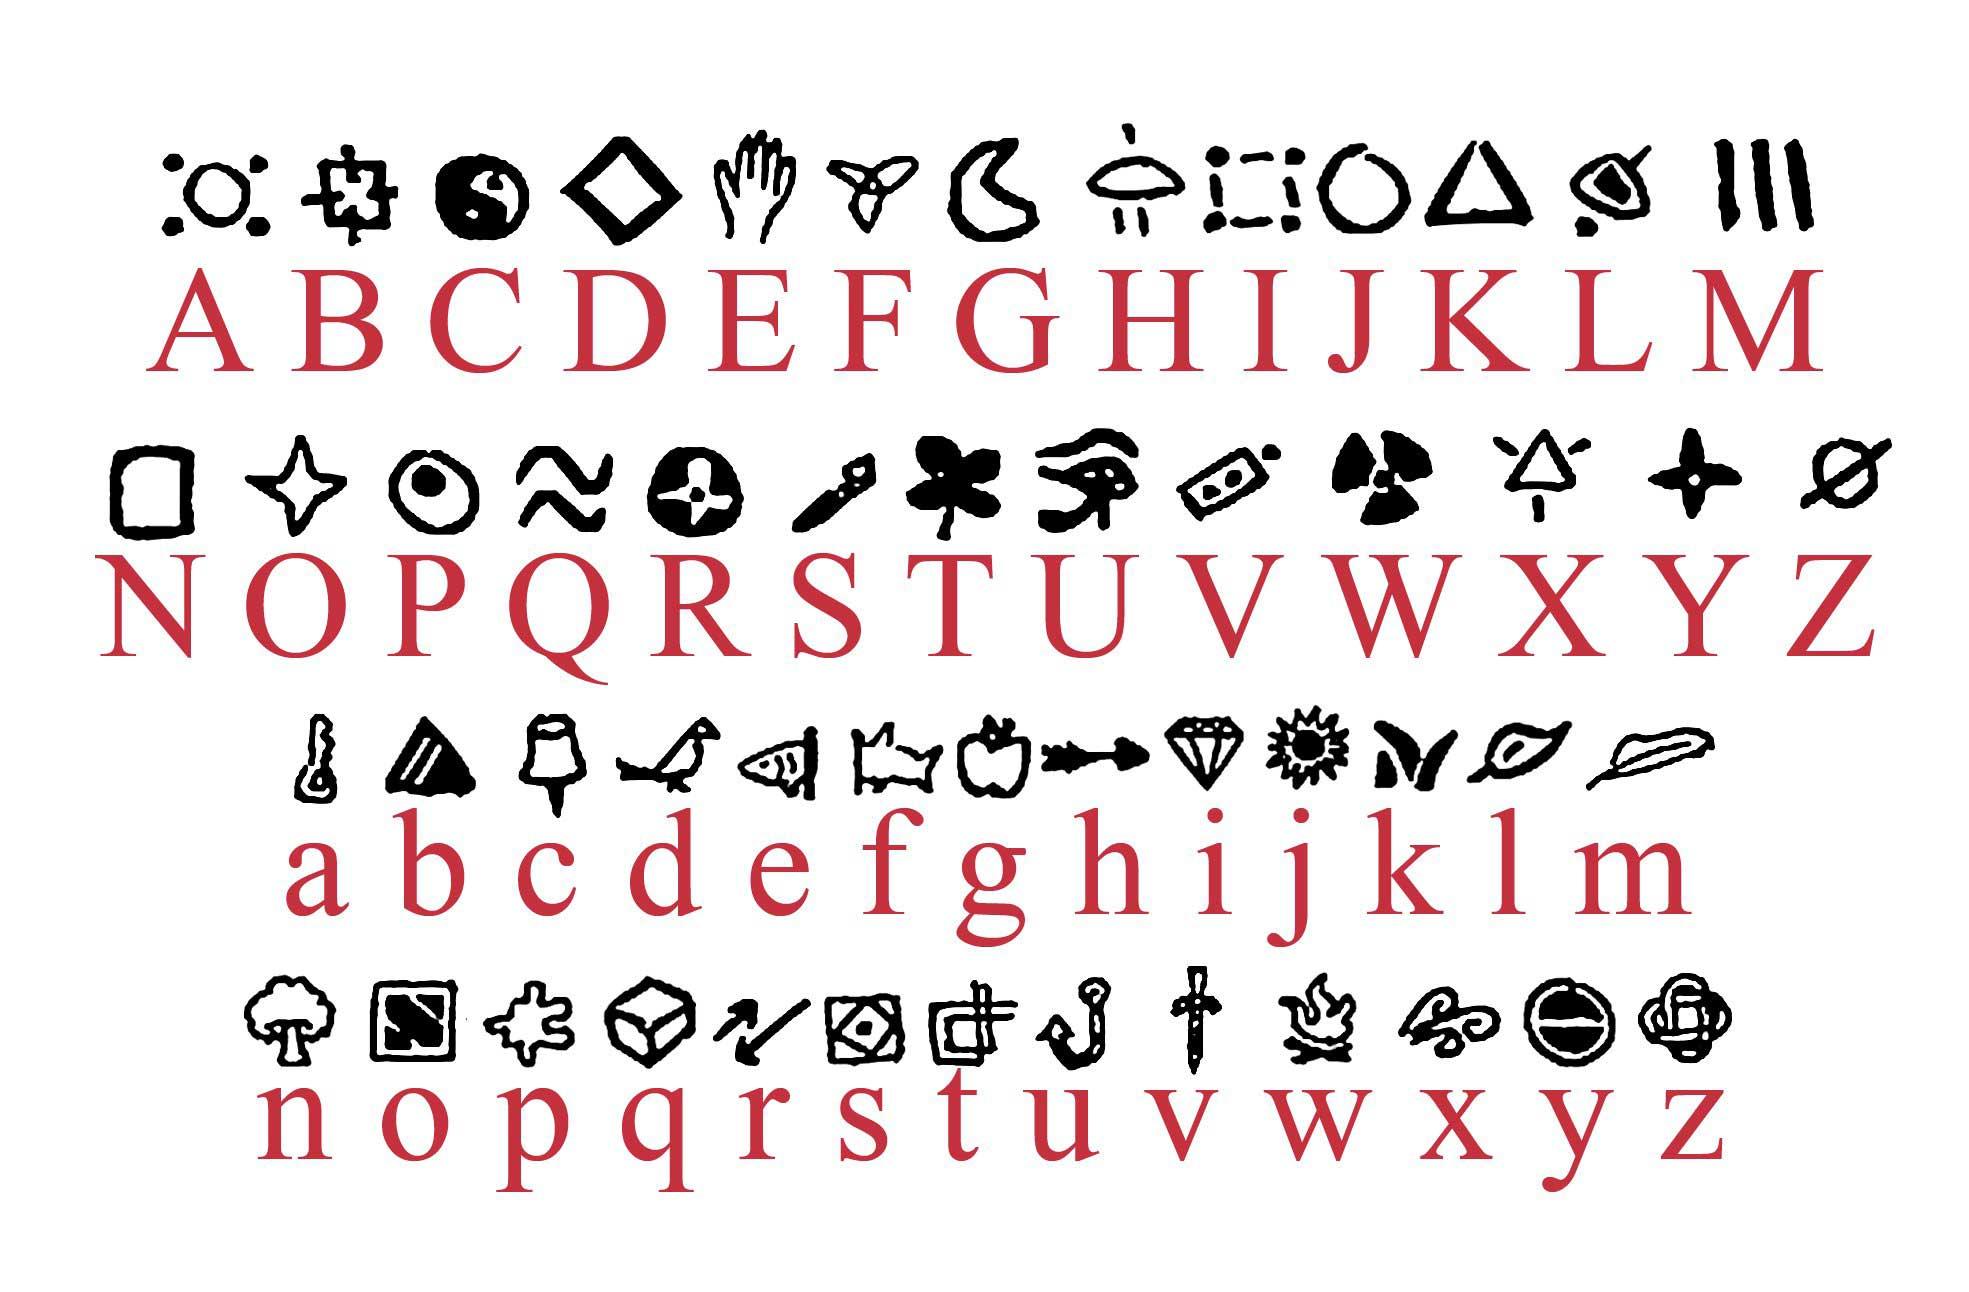 weldon-cipher-key.png